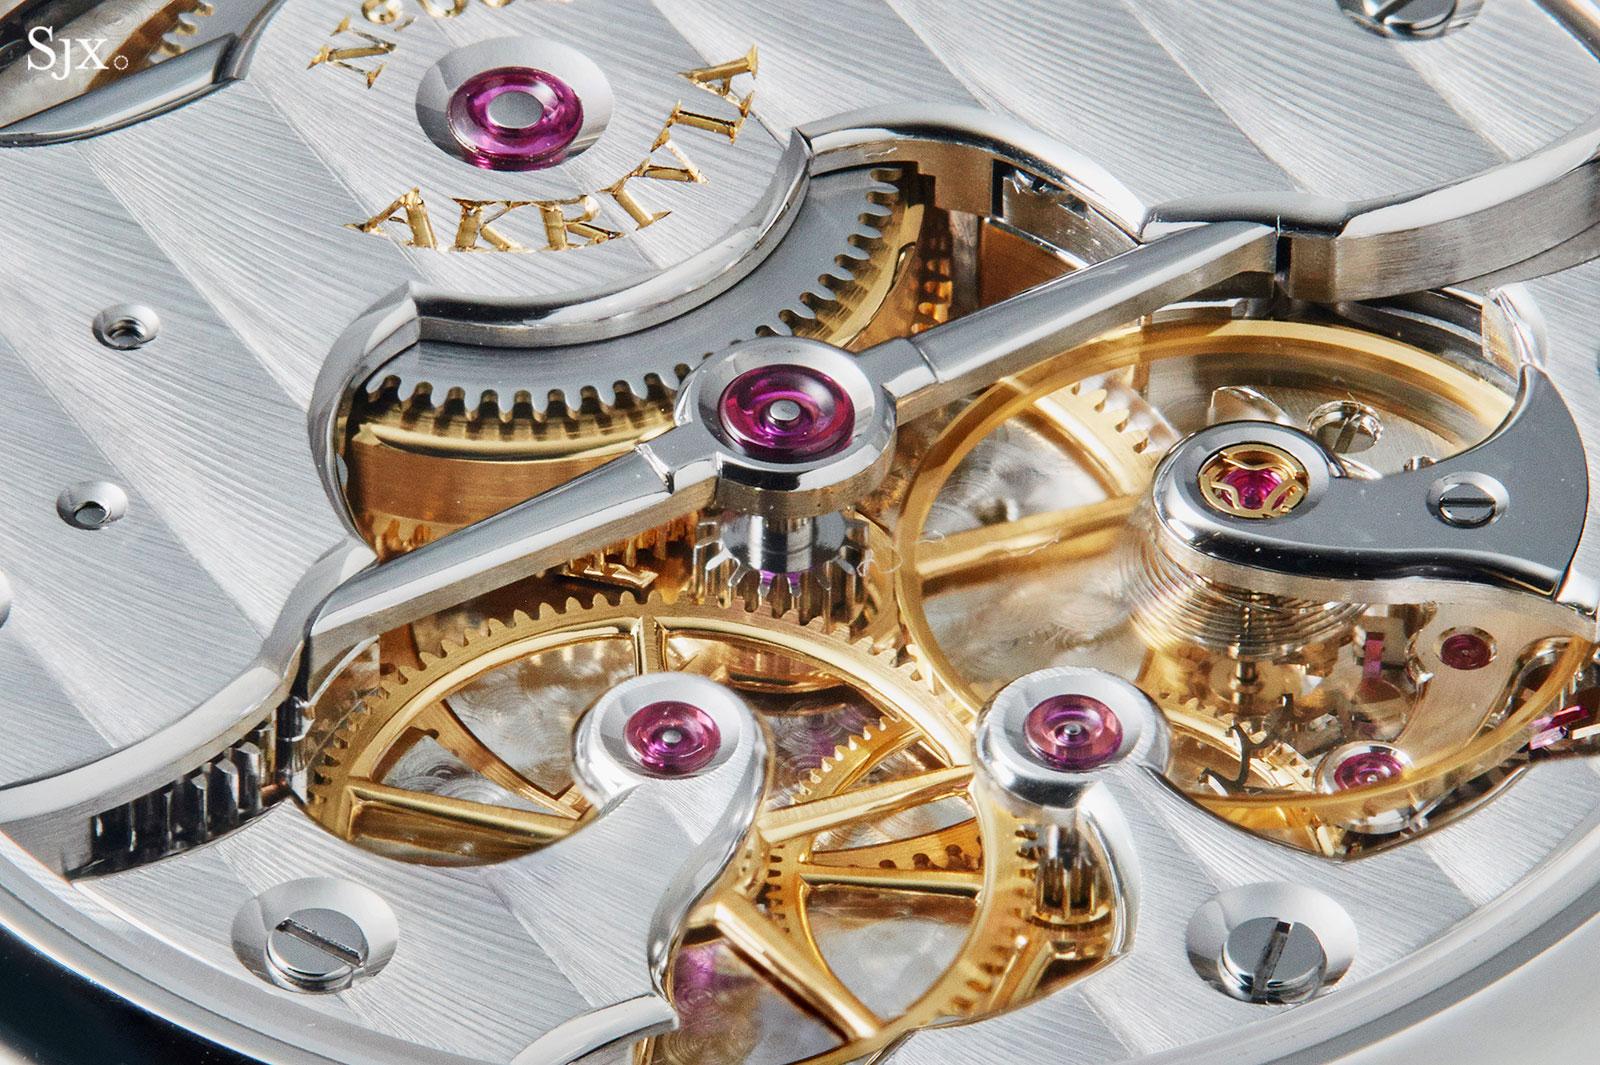 Akrivia Chronometre Contemporain Rexhep Rexhepi 15